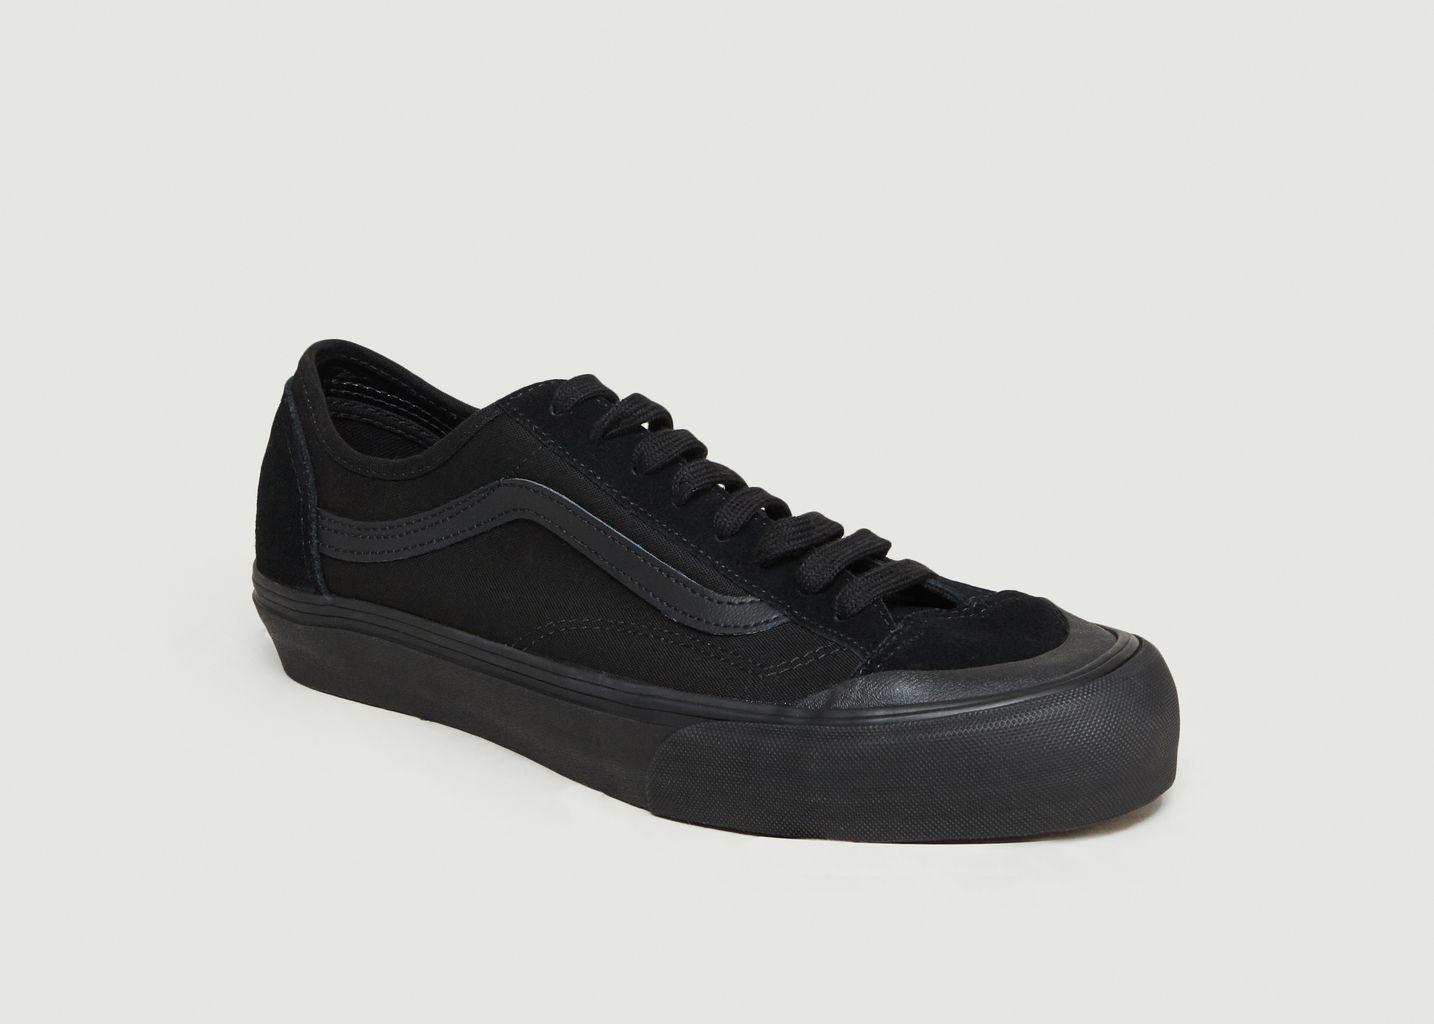 Decon SF Suede Skate Shoes Black Vans